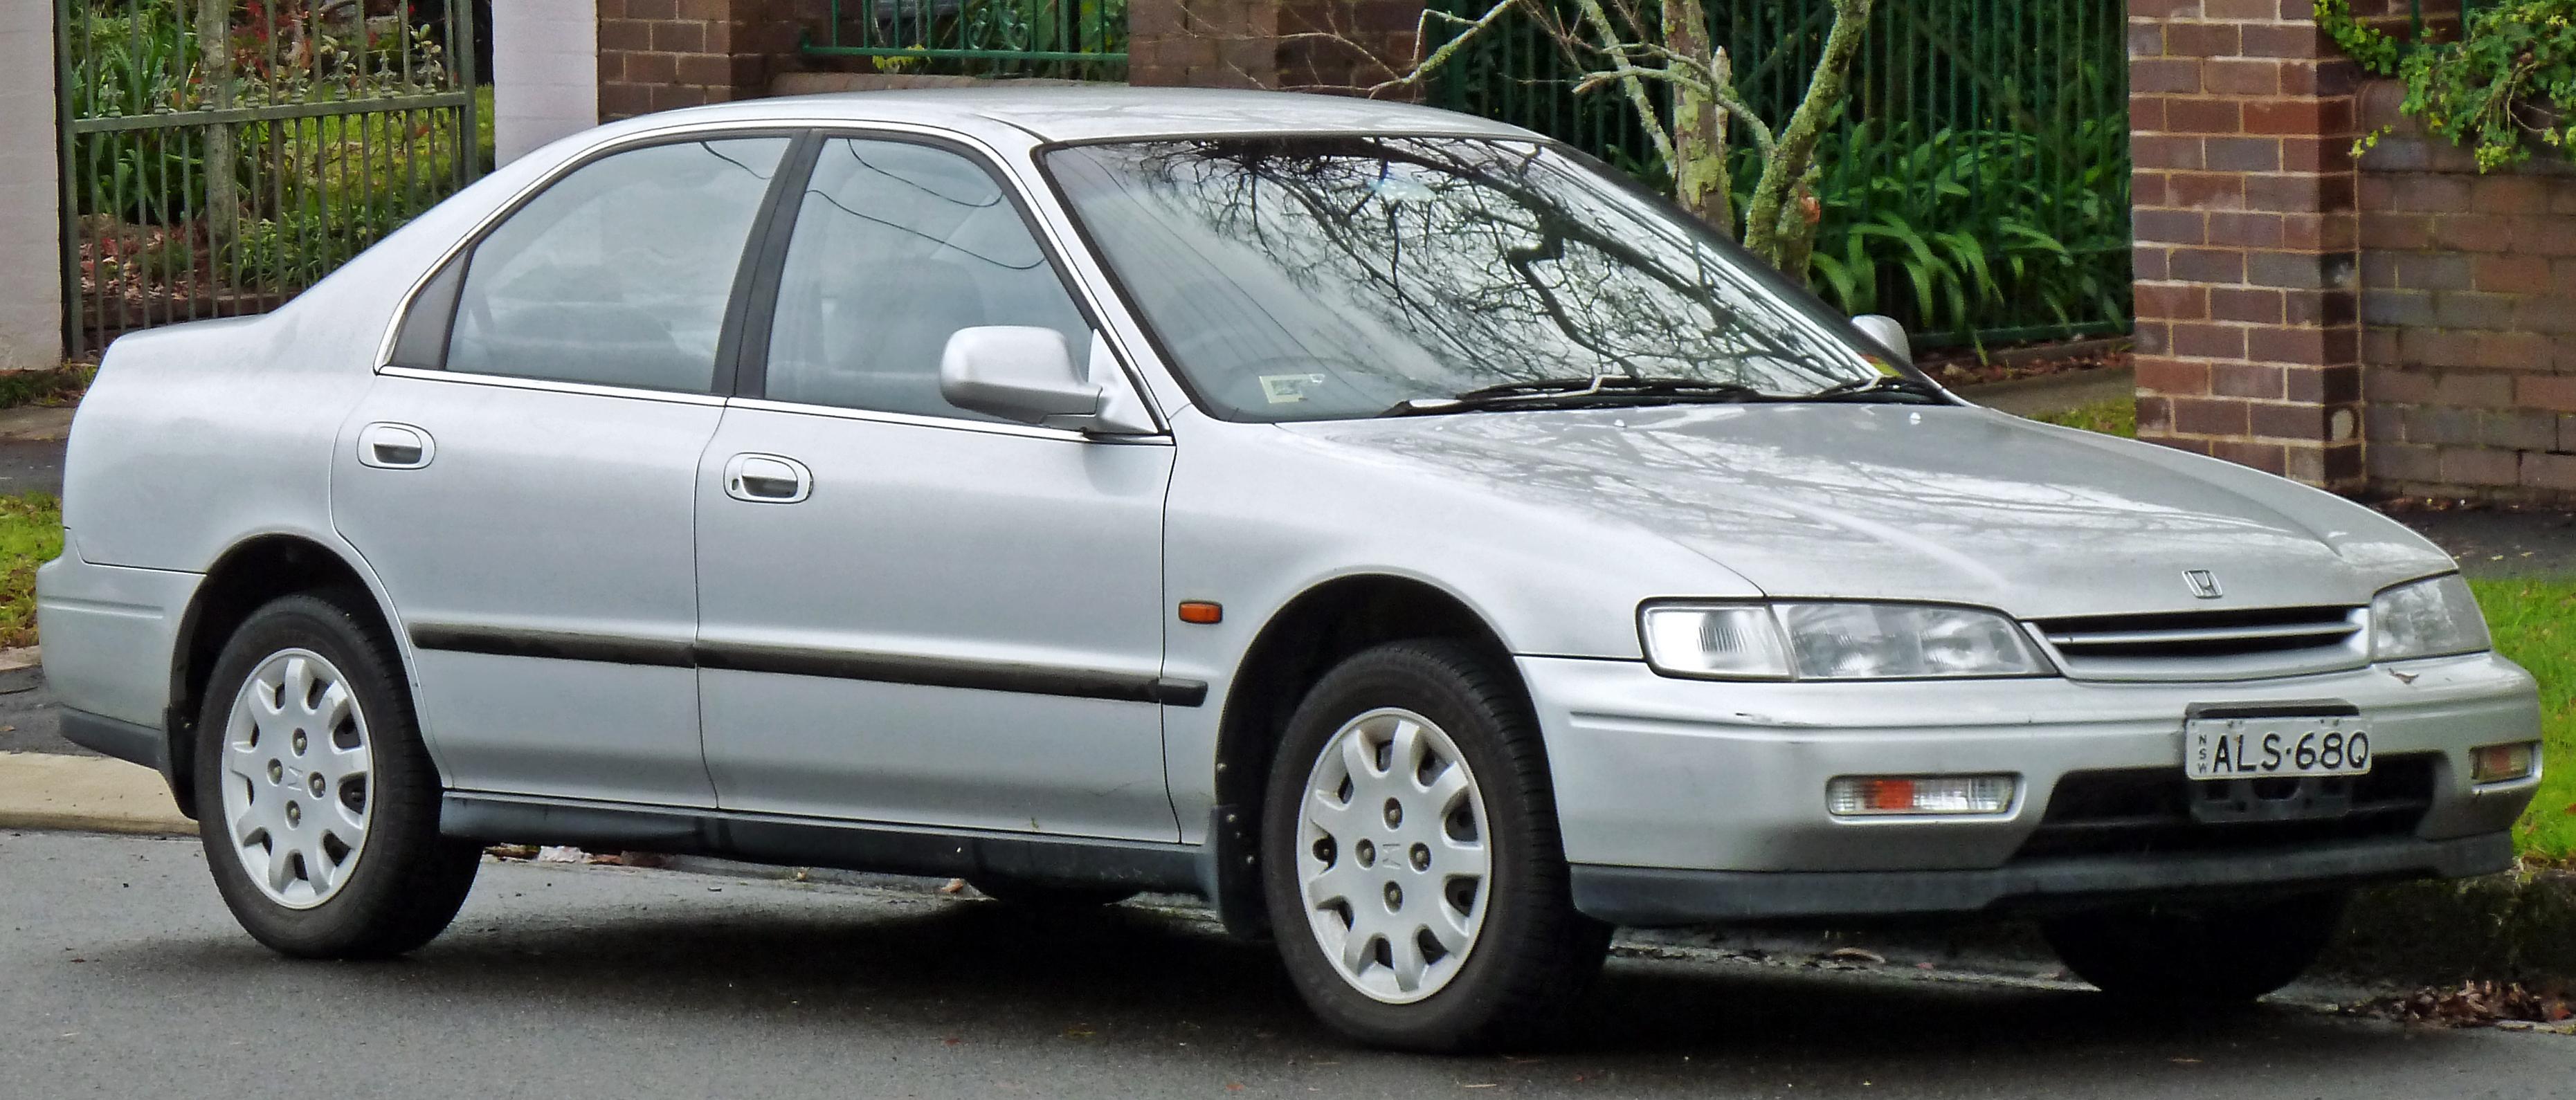 File 1993 1995 Honda Accord Exi Sedan 2011 06 15 Jpg